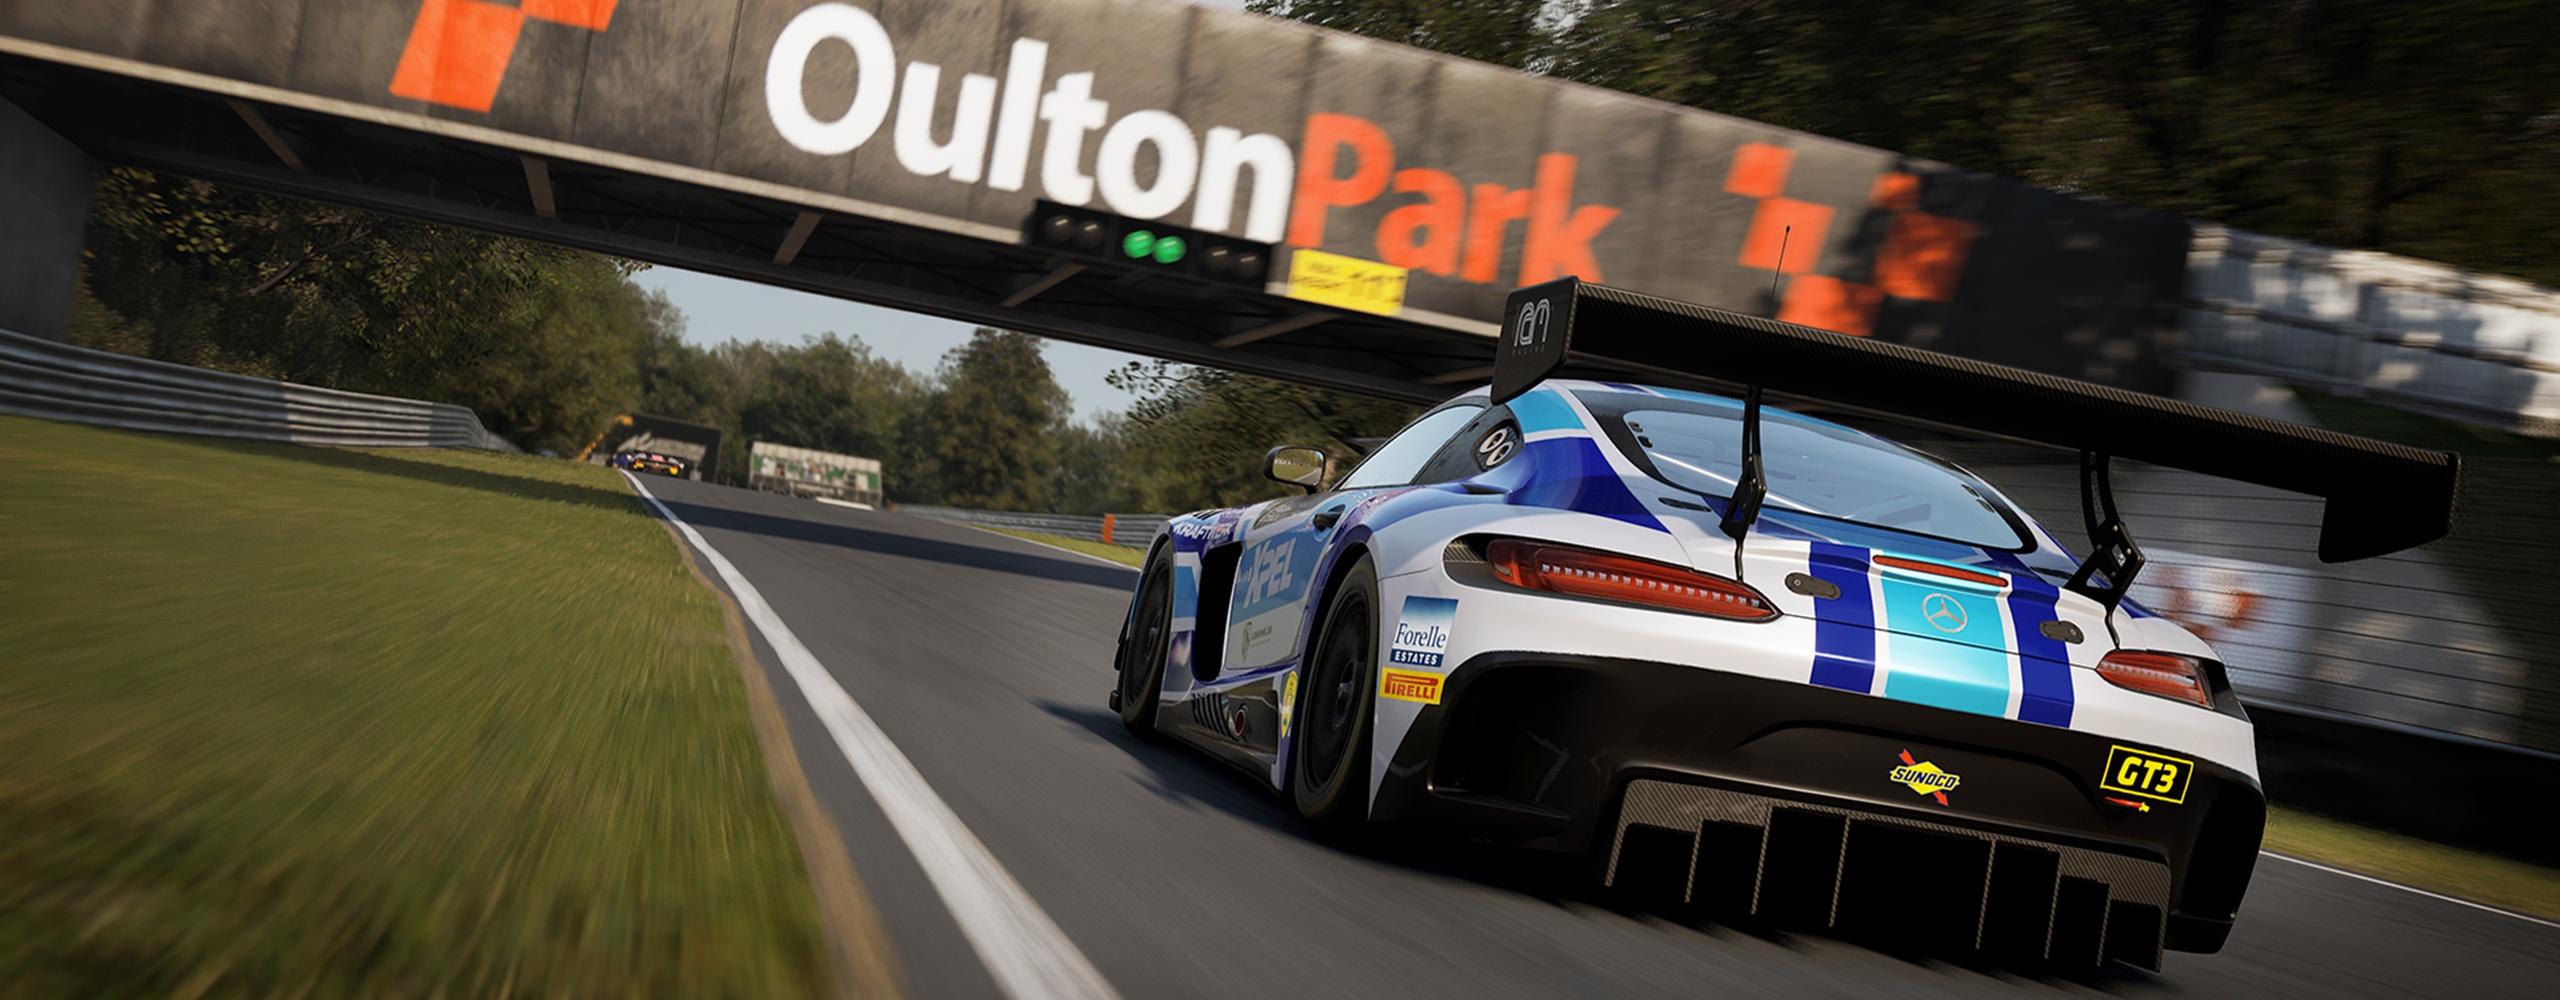 Upcoming Event: Assetto Corsa Competizione BRITISH GT PACK DLC Live Premiere Event